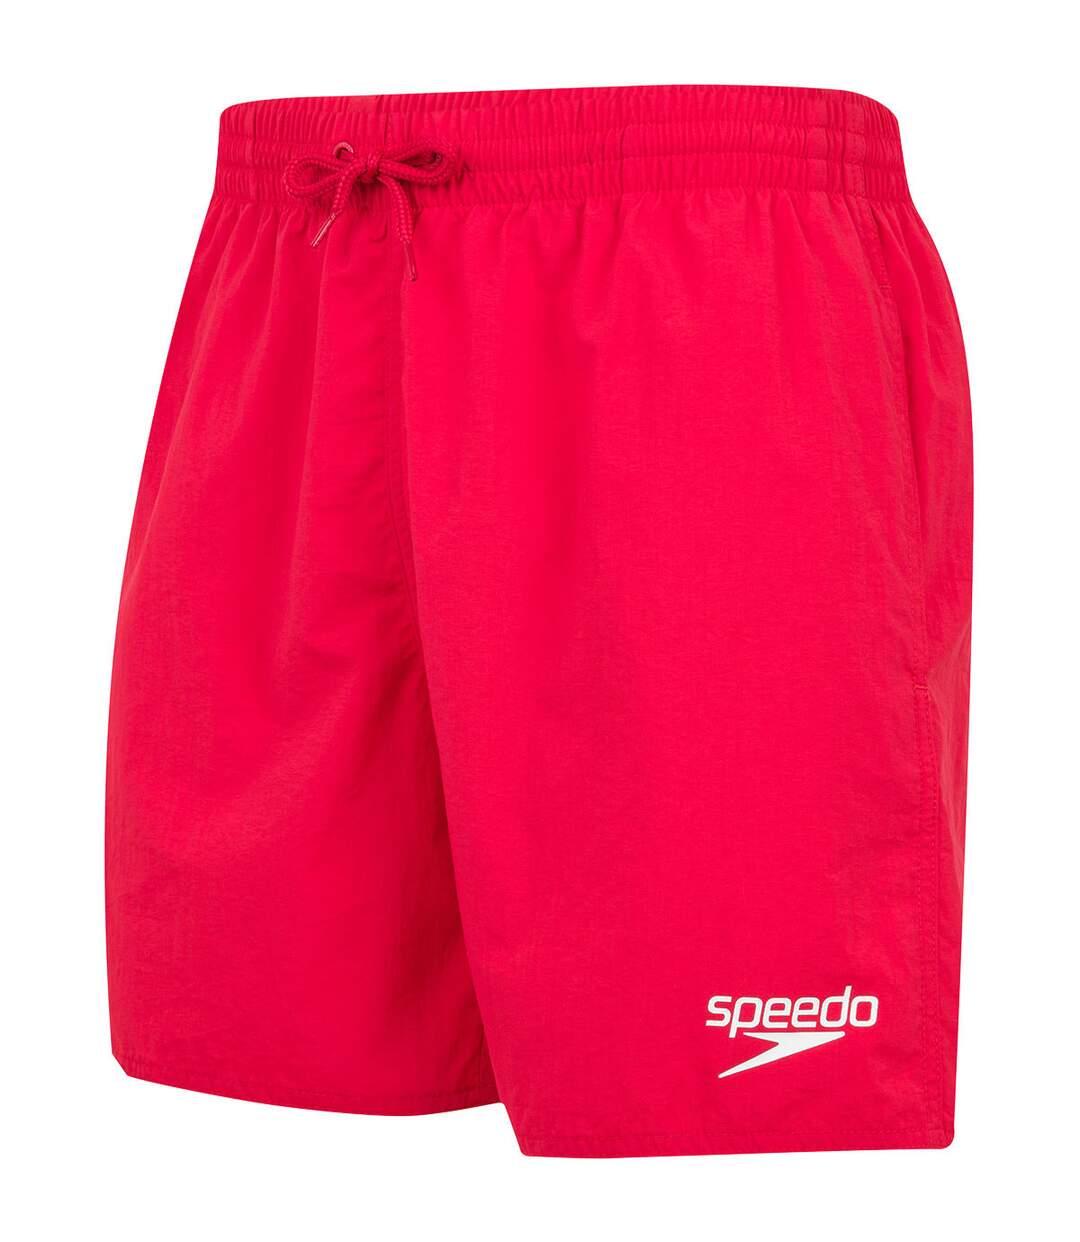 Speedo Mens Essentials 16 Swim Shorts (Red) - UTRD952